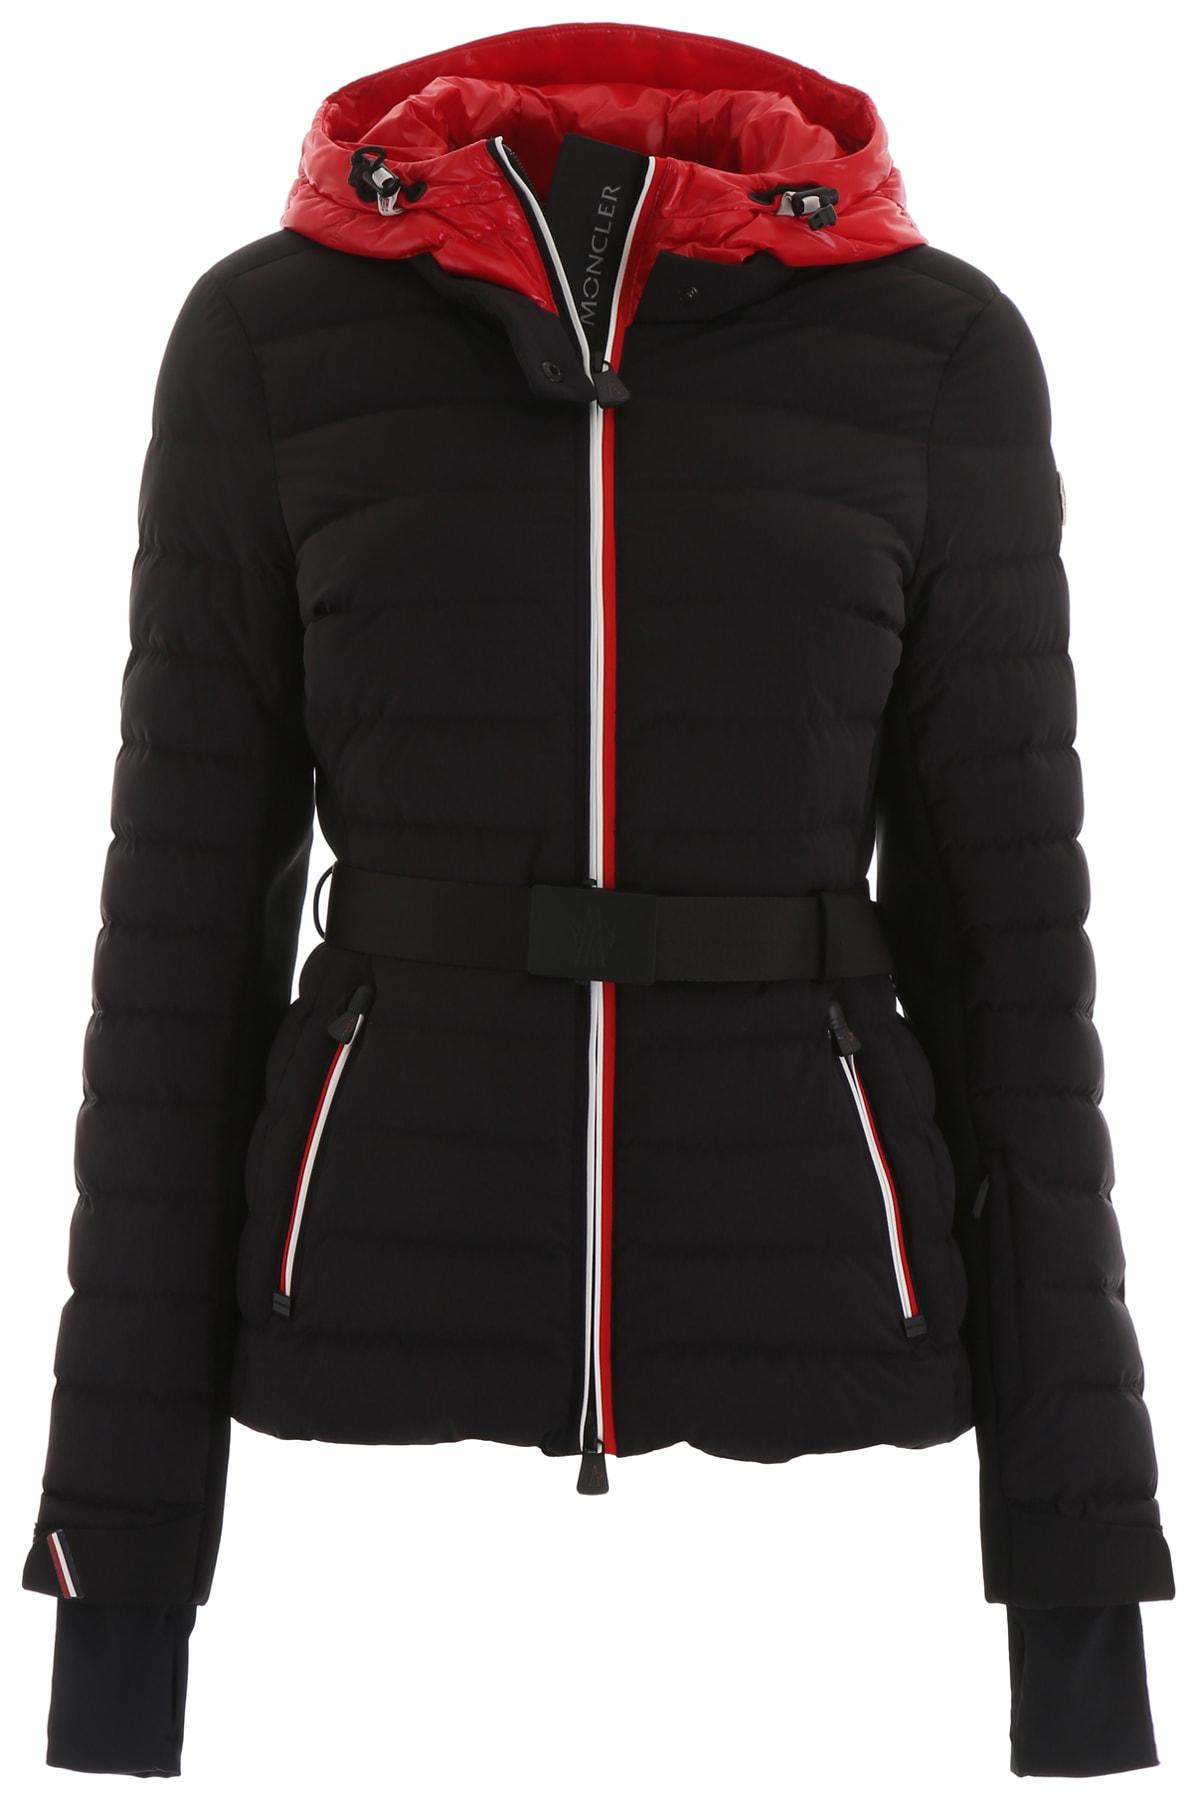 Moncler Grenoble Bruche Puffer Jacket